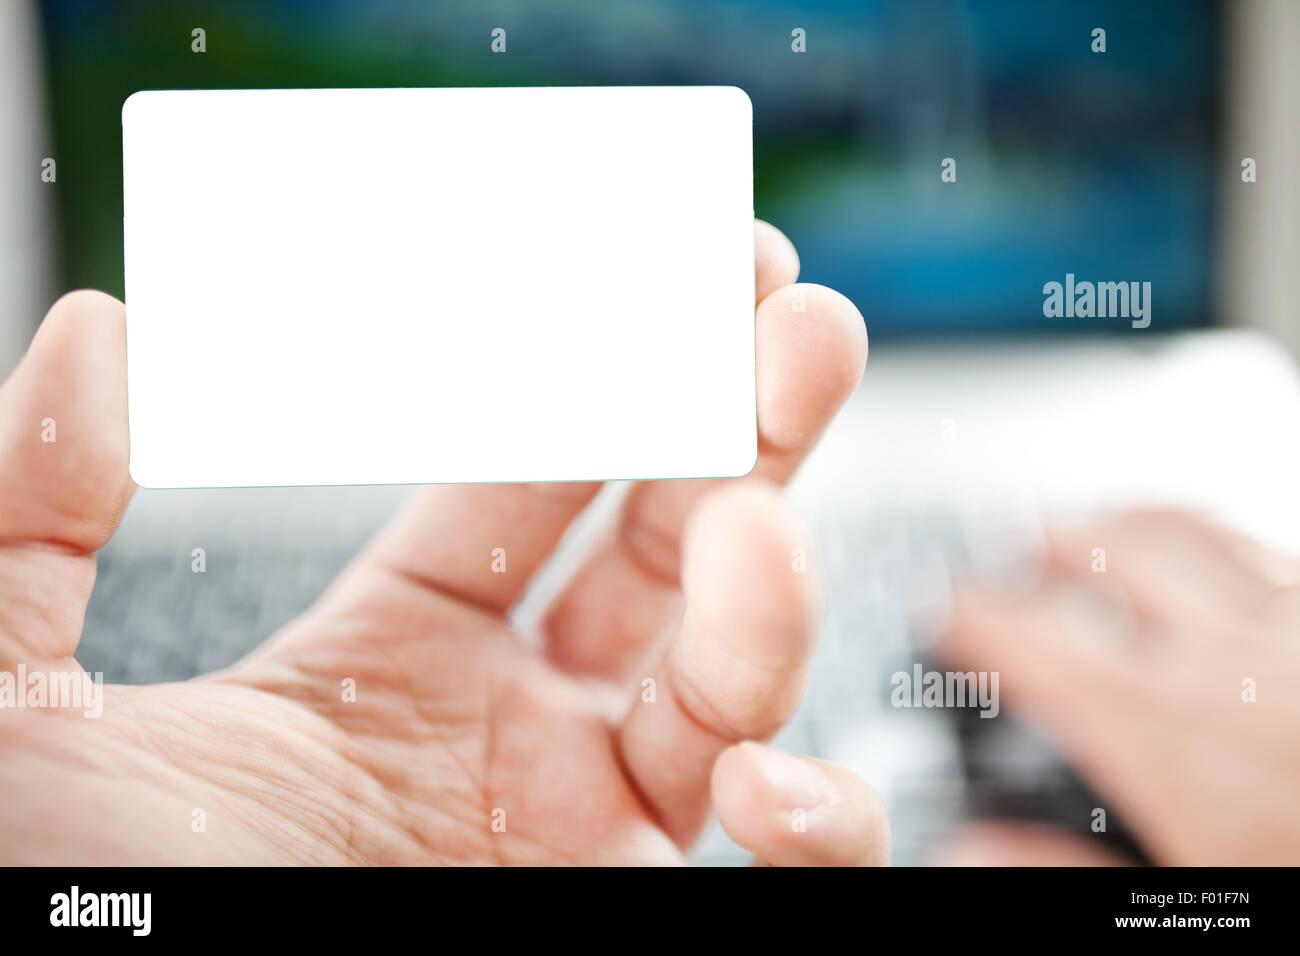 Cvv Stockfotos & Cvv Bilder - Alamy